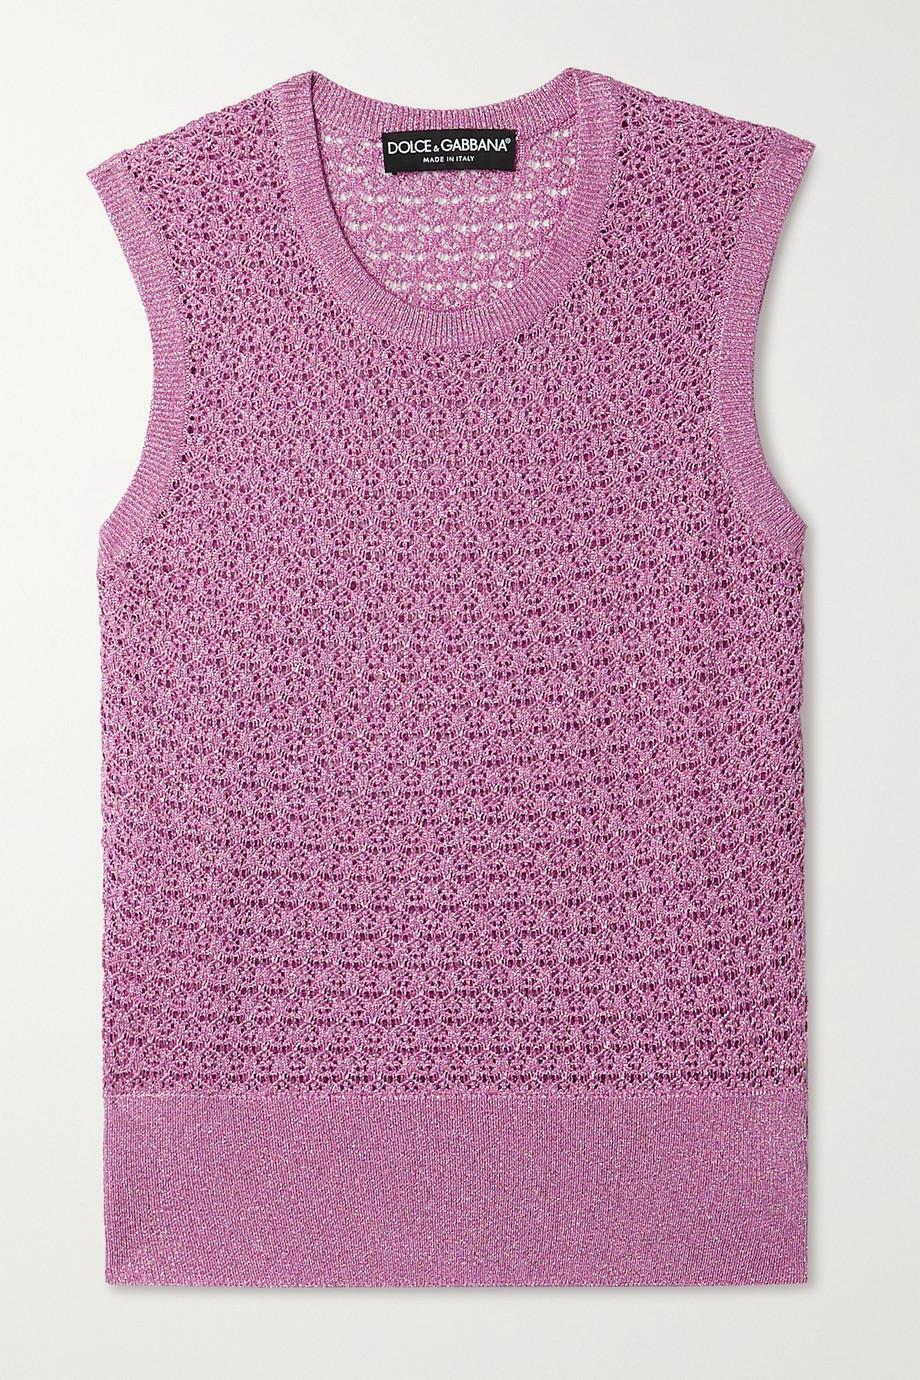 Dolce & Gabbana Metallic knitted tank